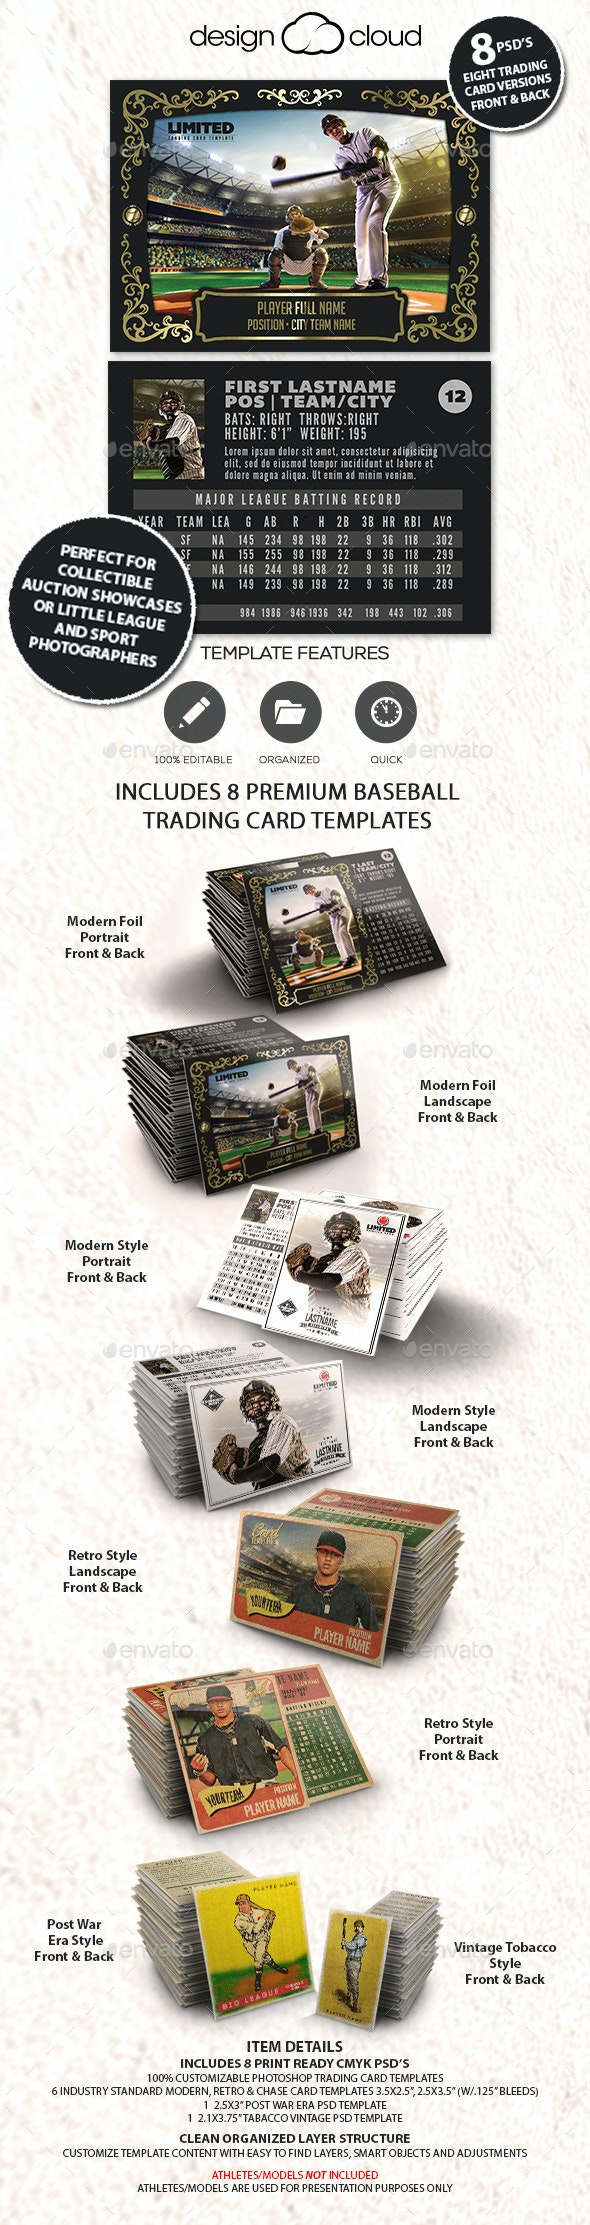 8 Premium Baseball Trading Card Templates Collection - Miscellaneous Print Templates